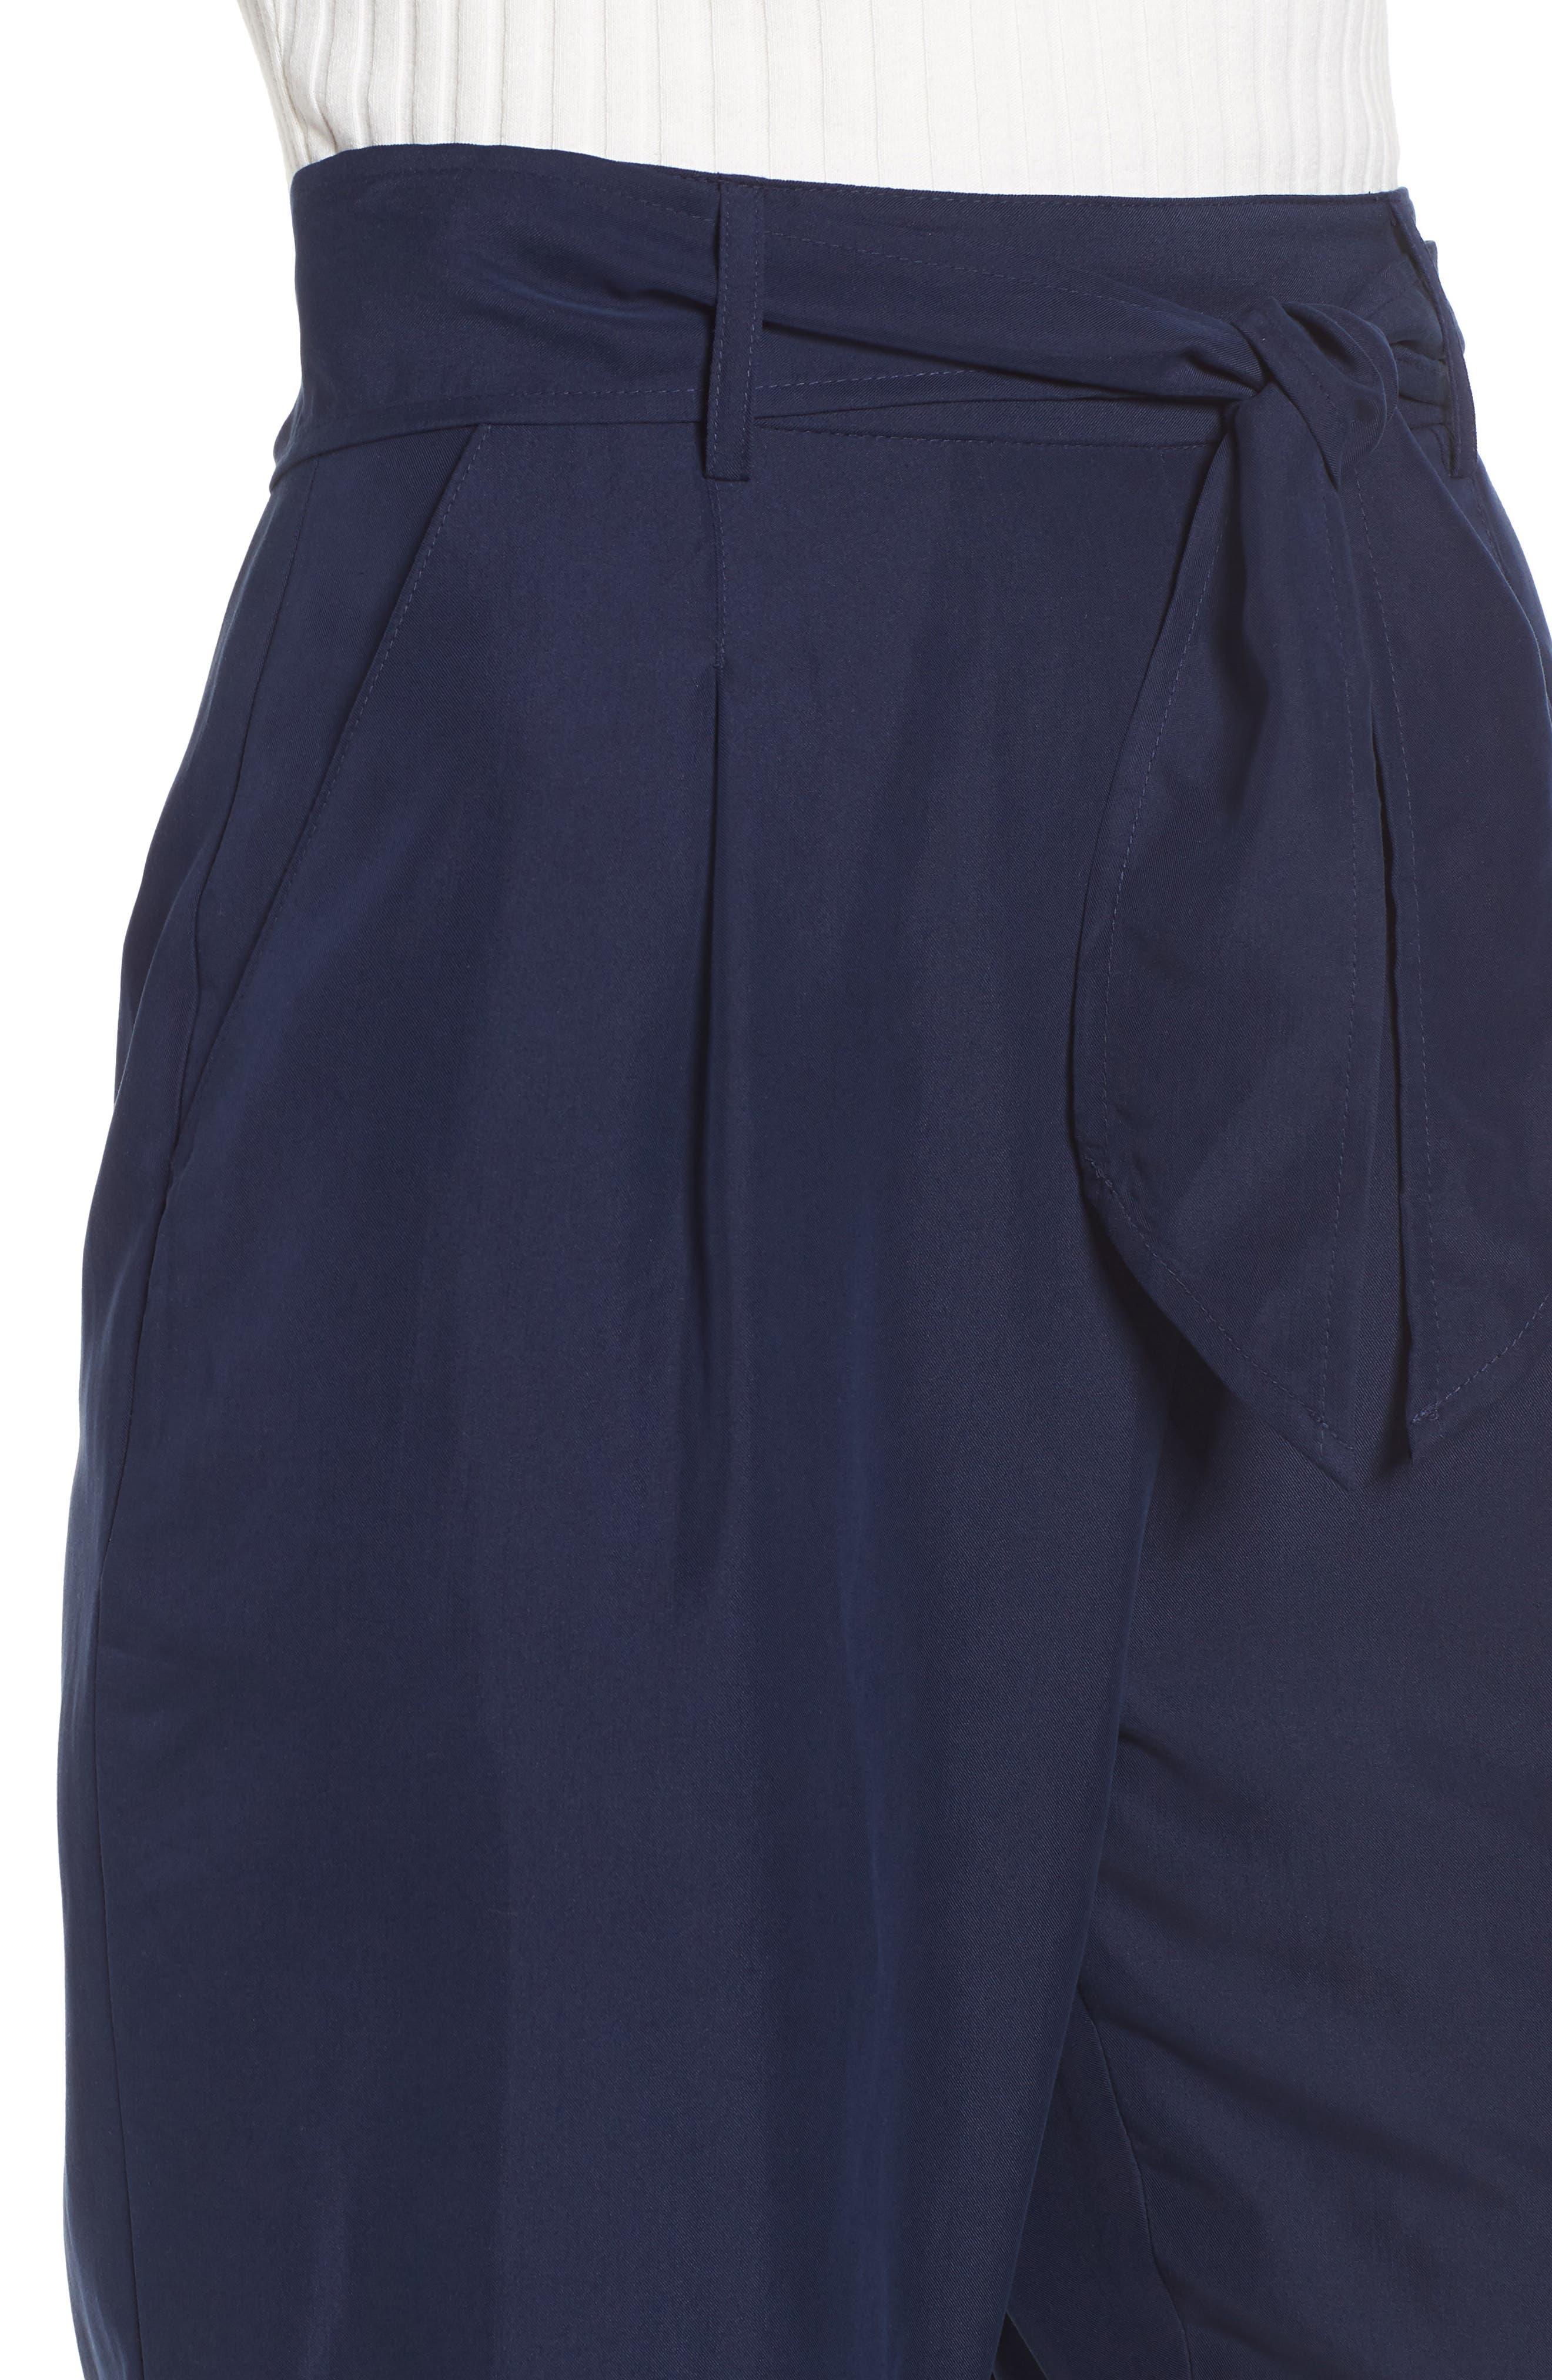 Tie Waist Pants,                             Alternate thumbnail 4, color,                             Navy Evening